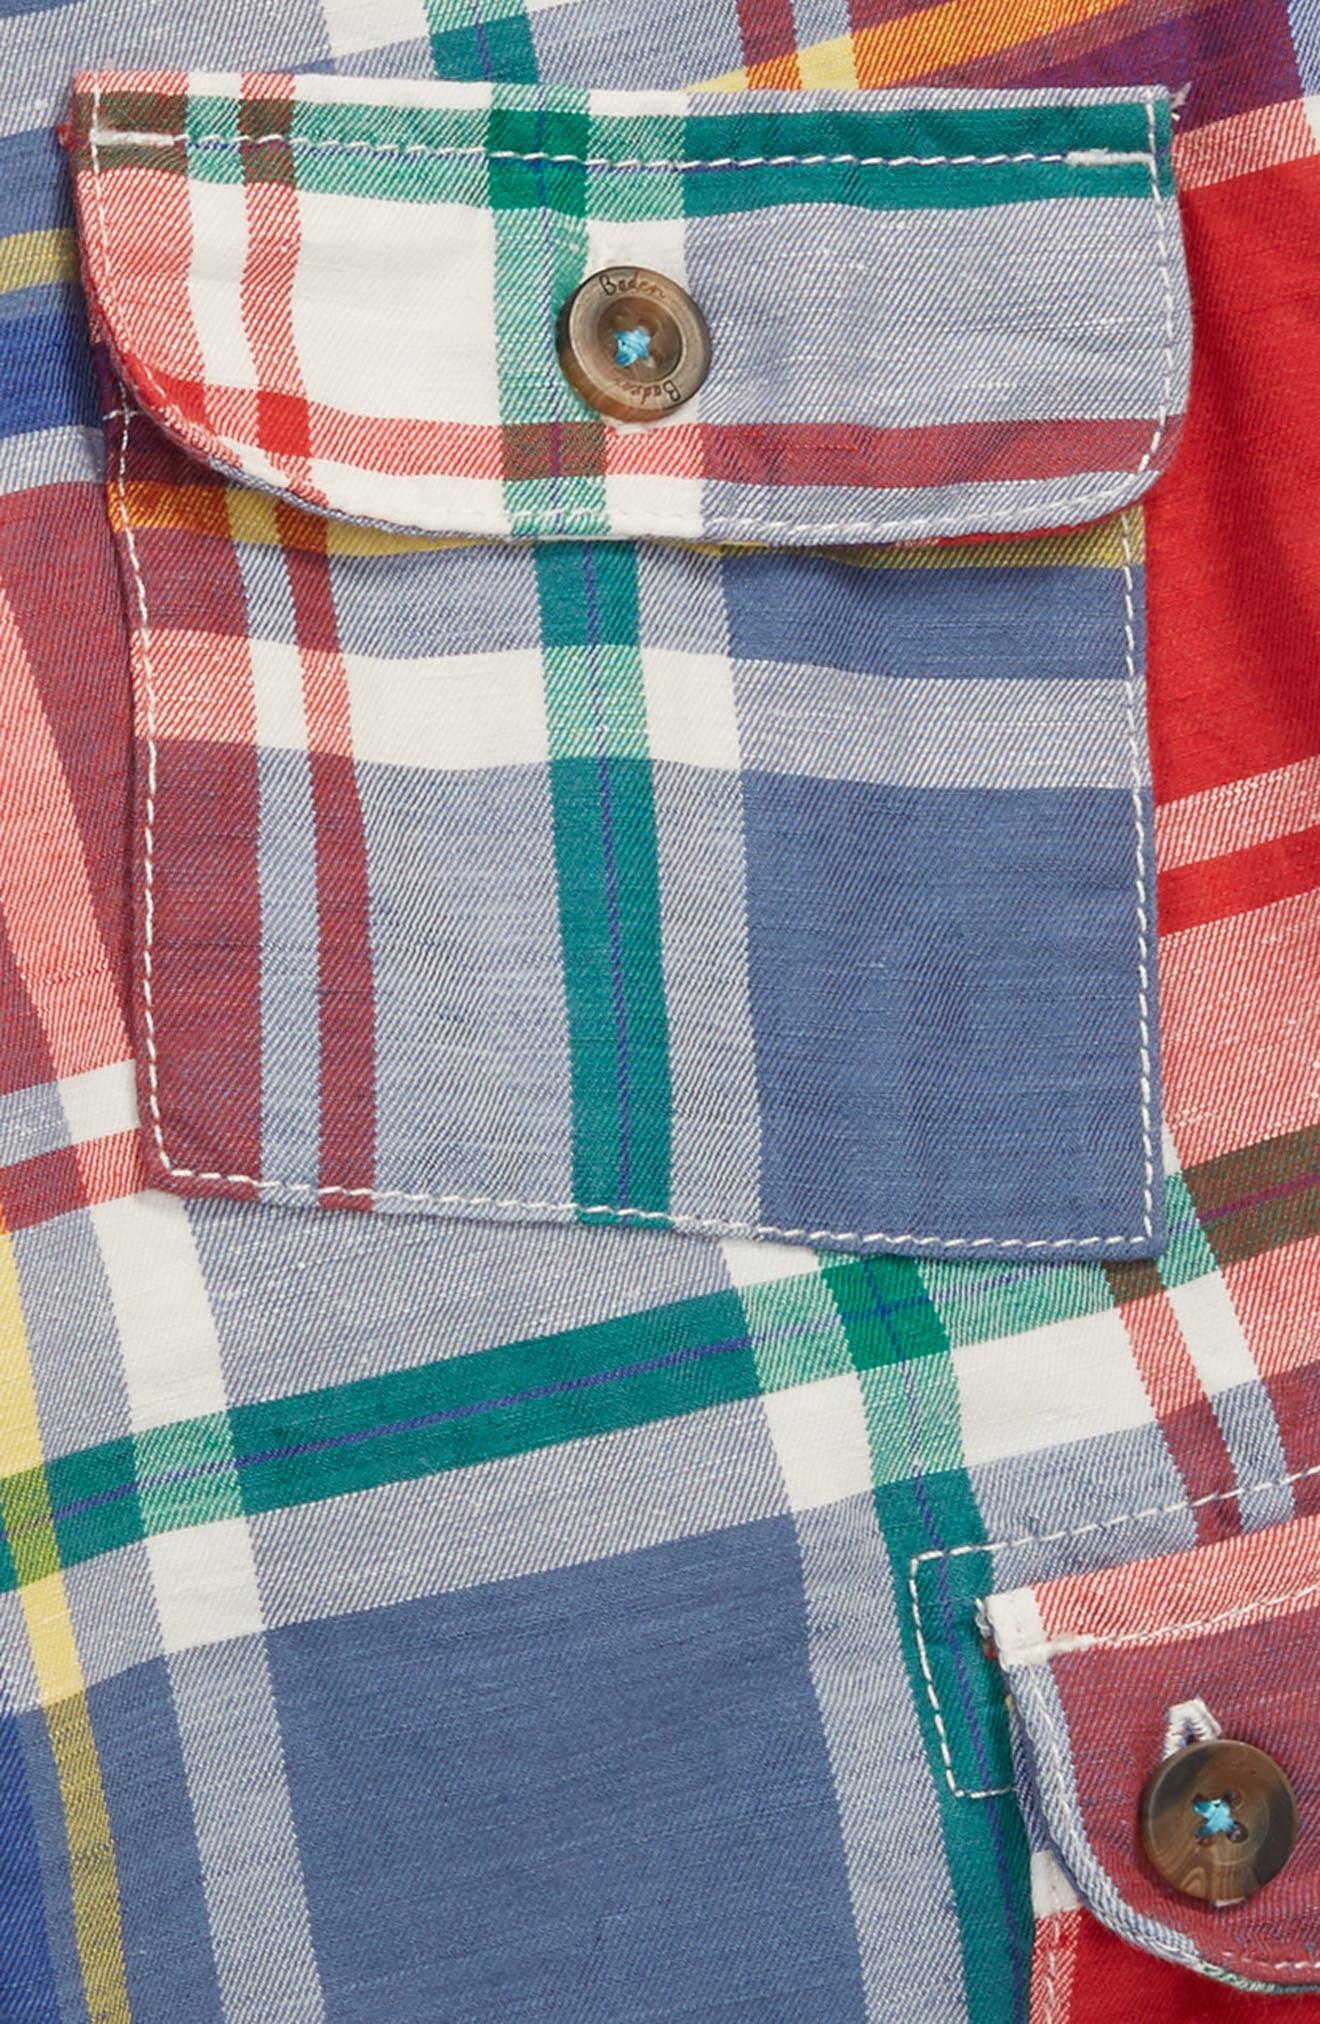 Plaid Cargo Shorts,                             Alternate thumbnail 3, color,                             Washed Crimson Red/ Blue